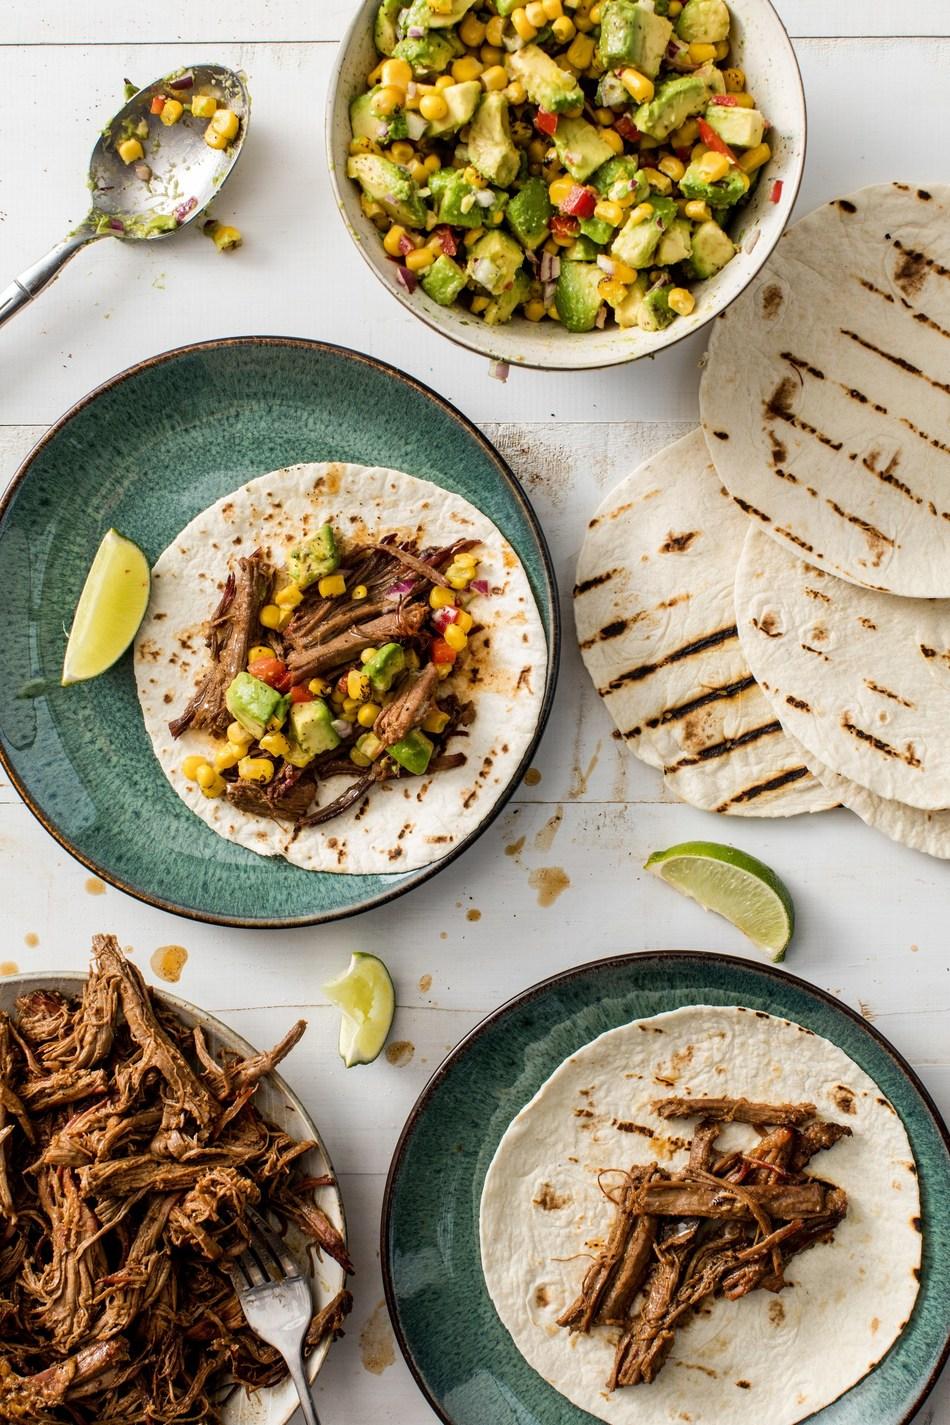 Stubb's Brisket Tacos with Roasted Corn Avocado Salsa